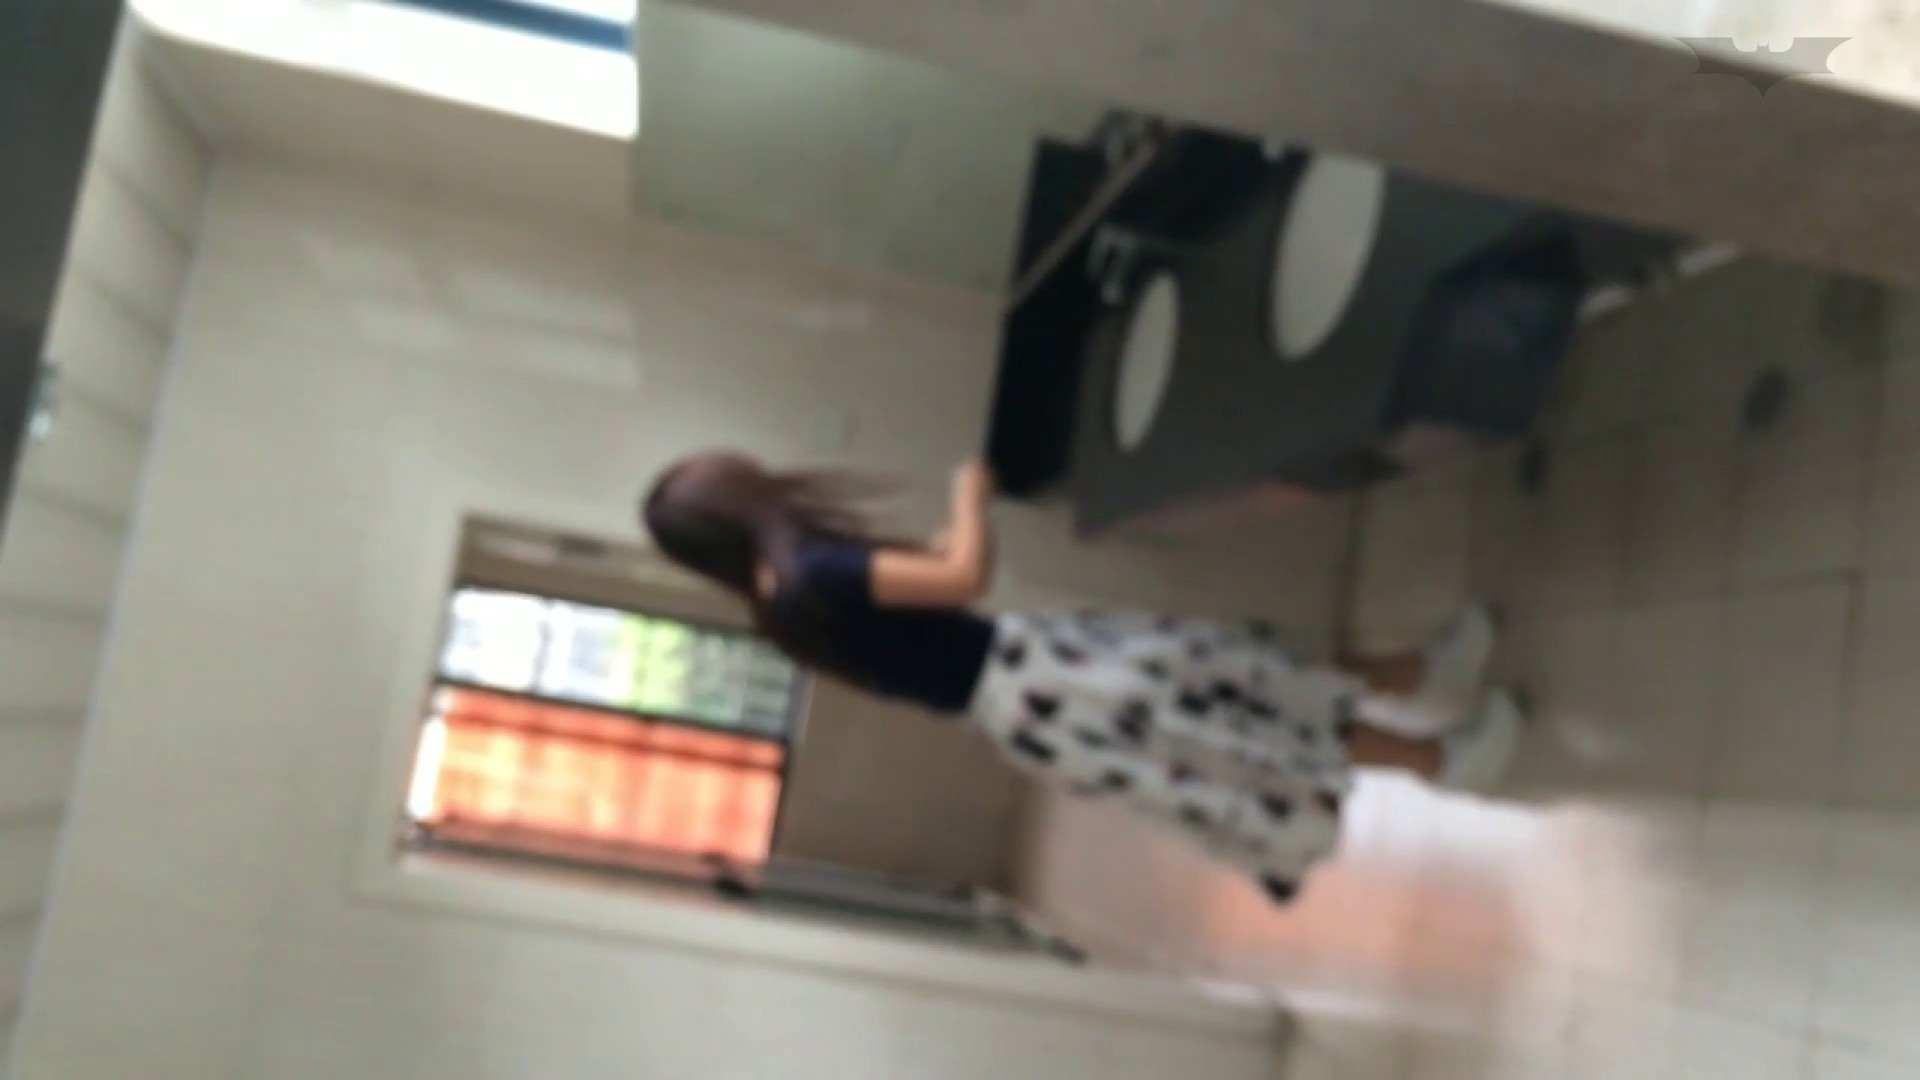 JD盗撮 美女の洗面所の秘密 Vol.45 OLの実態  80pic 10